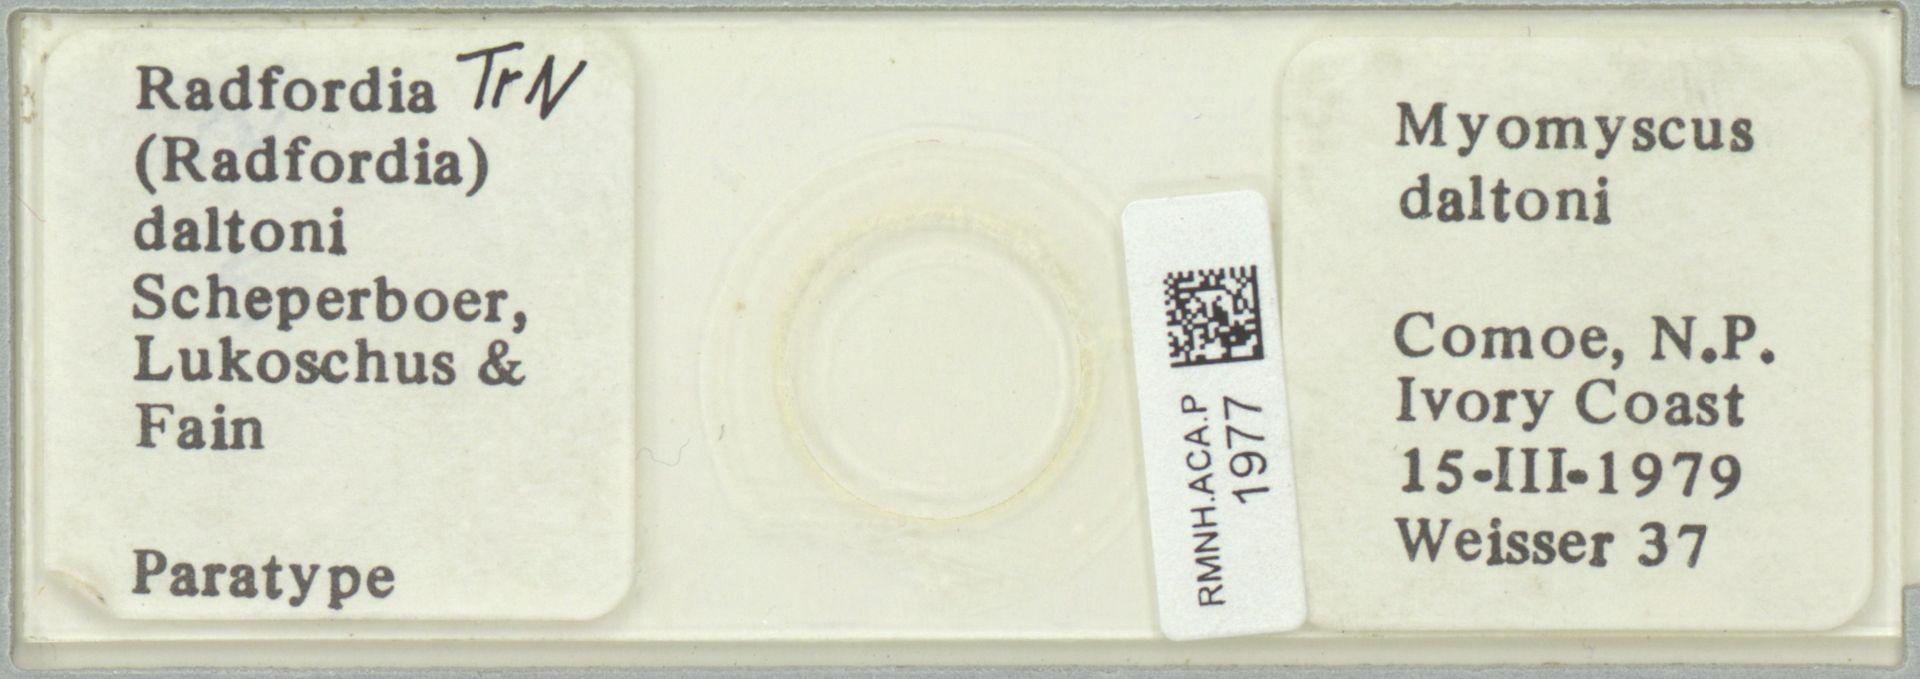 RMNH.ACA.P.1977 | Radfordia (Radfordia) daltoni Scherperboer, Lukoschus & Fain